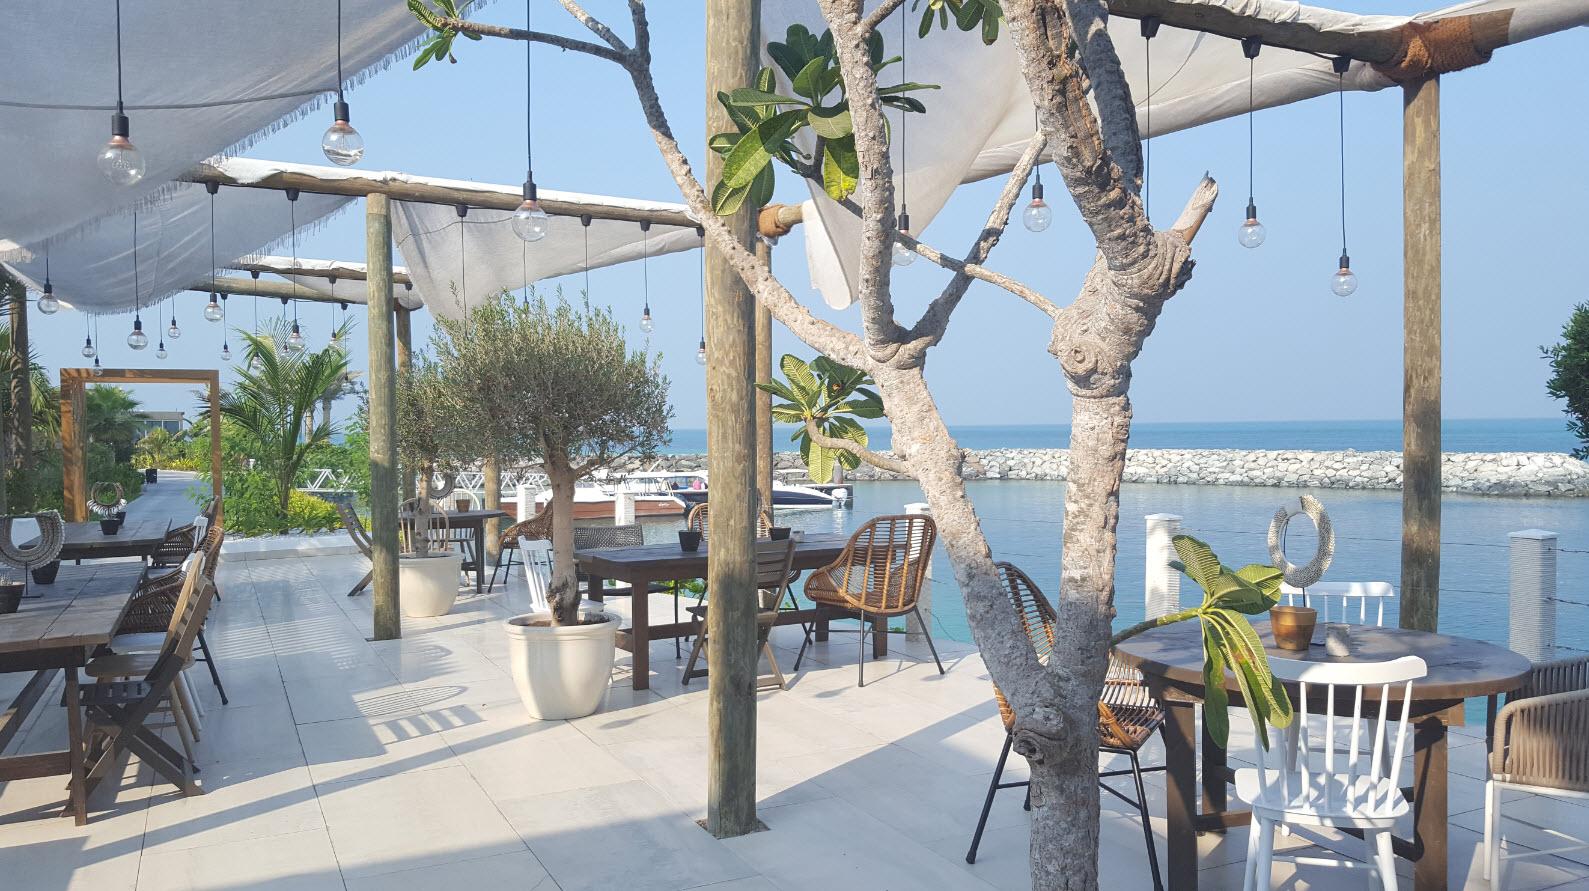 Restaurant Hooked Abu Dhabi